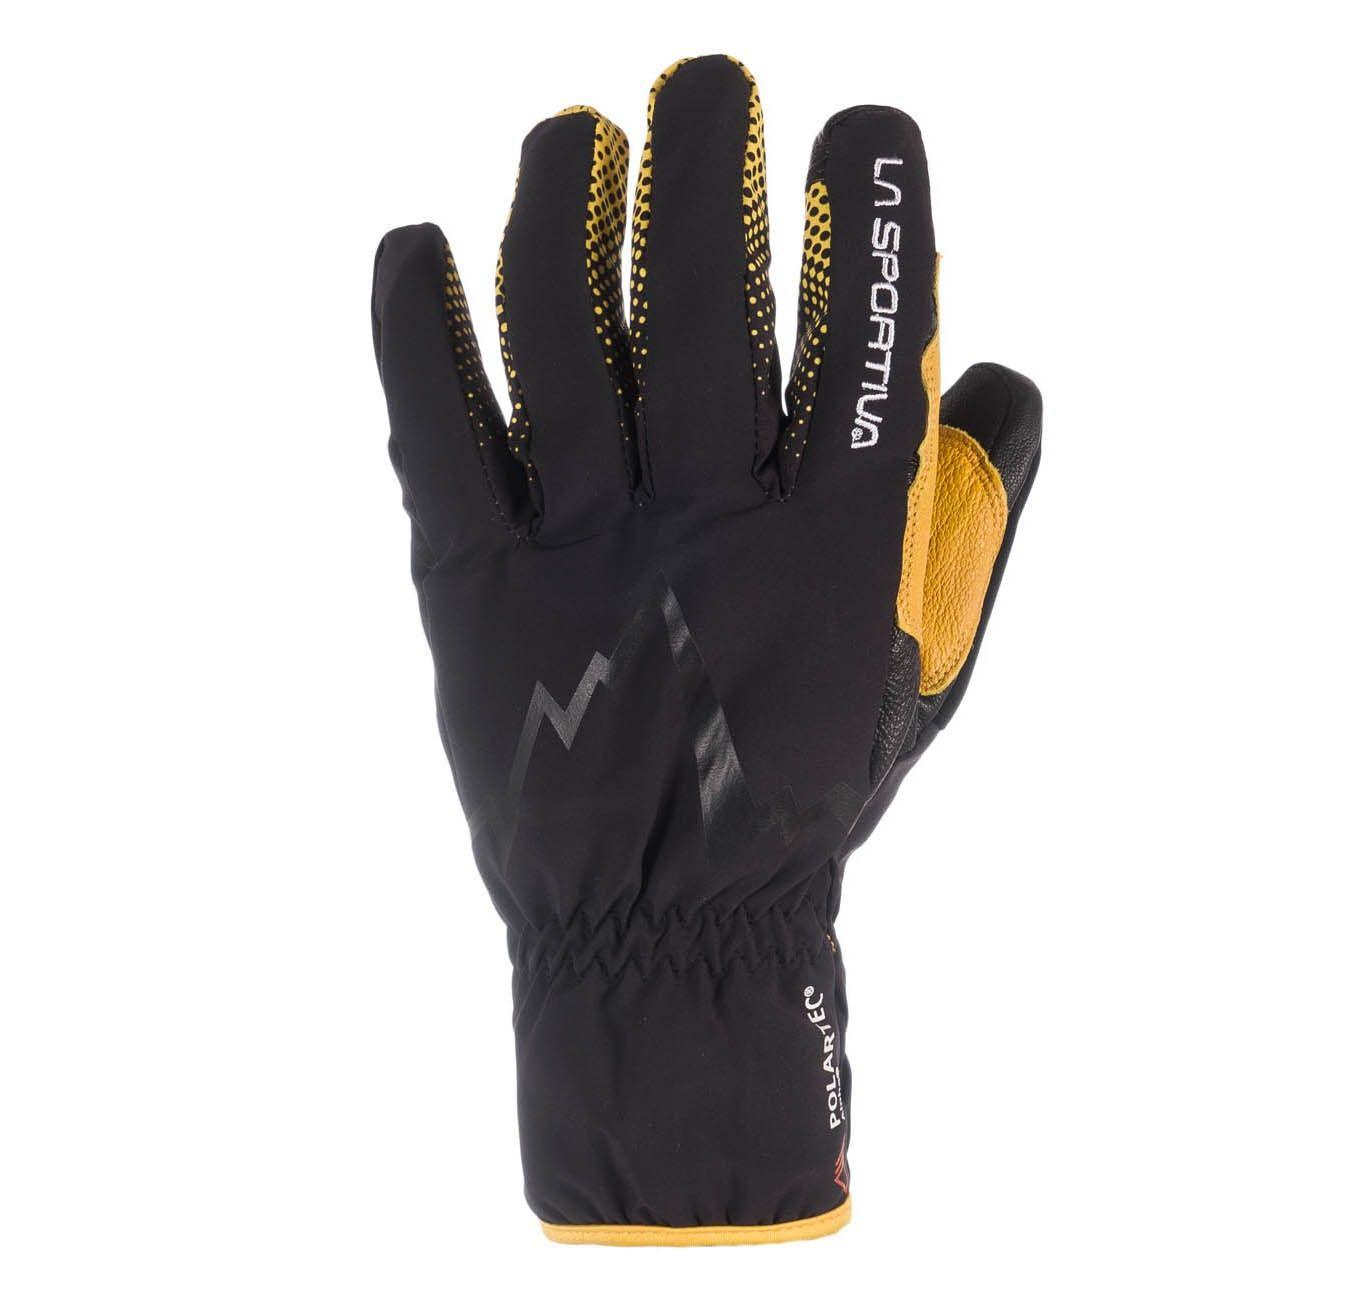 La Sportiva Skimo Gloves Schwarz, Merino Accessoires, XL